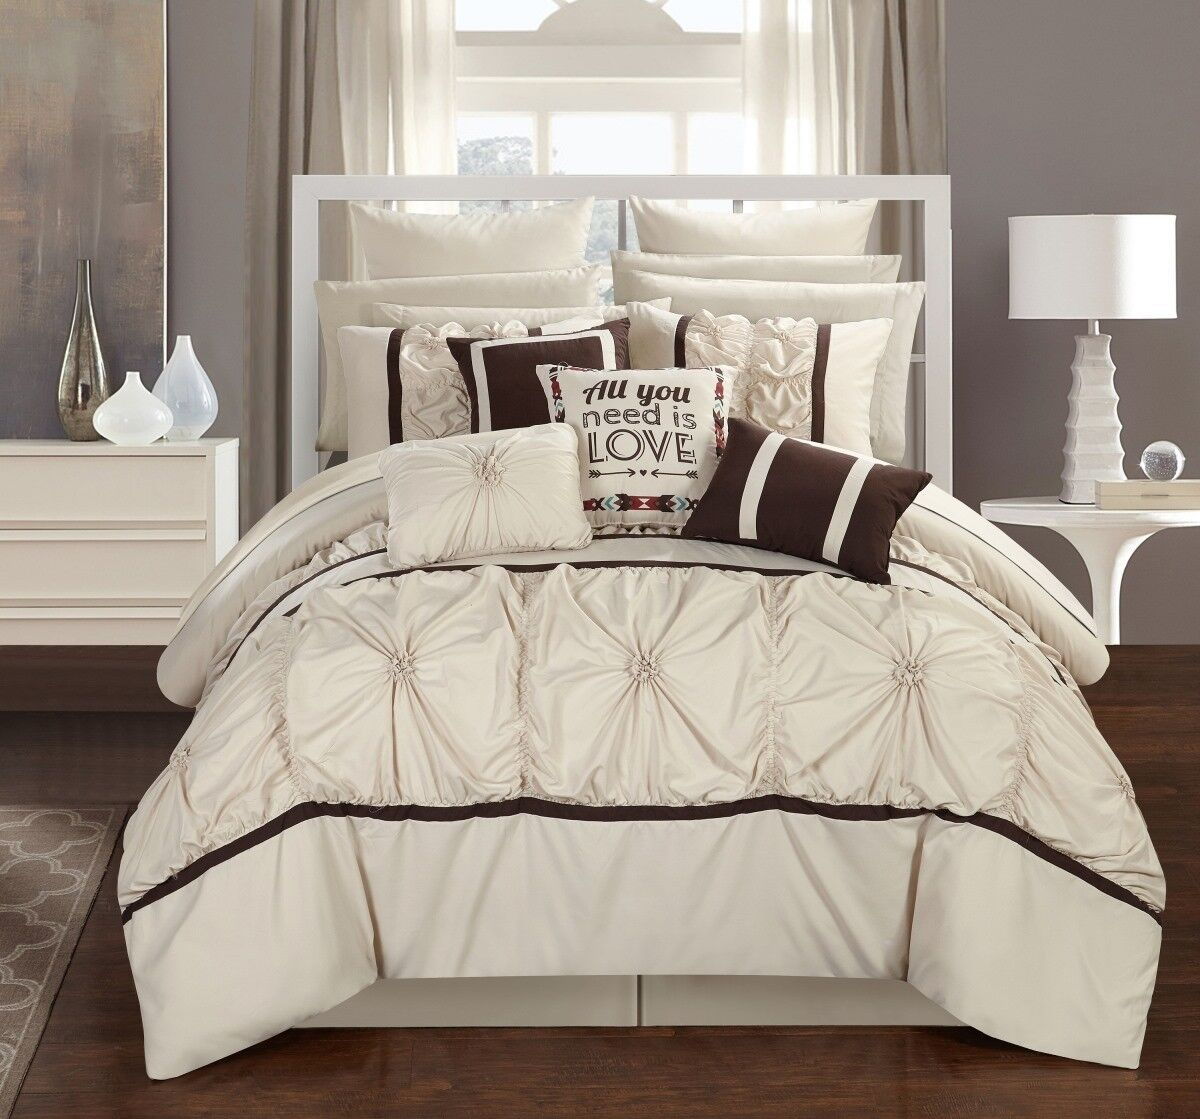 Chic Home CS2755-US Ashville King Size Comforter Set Beige -